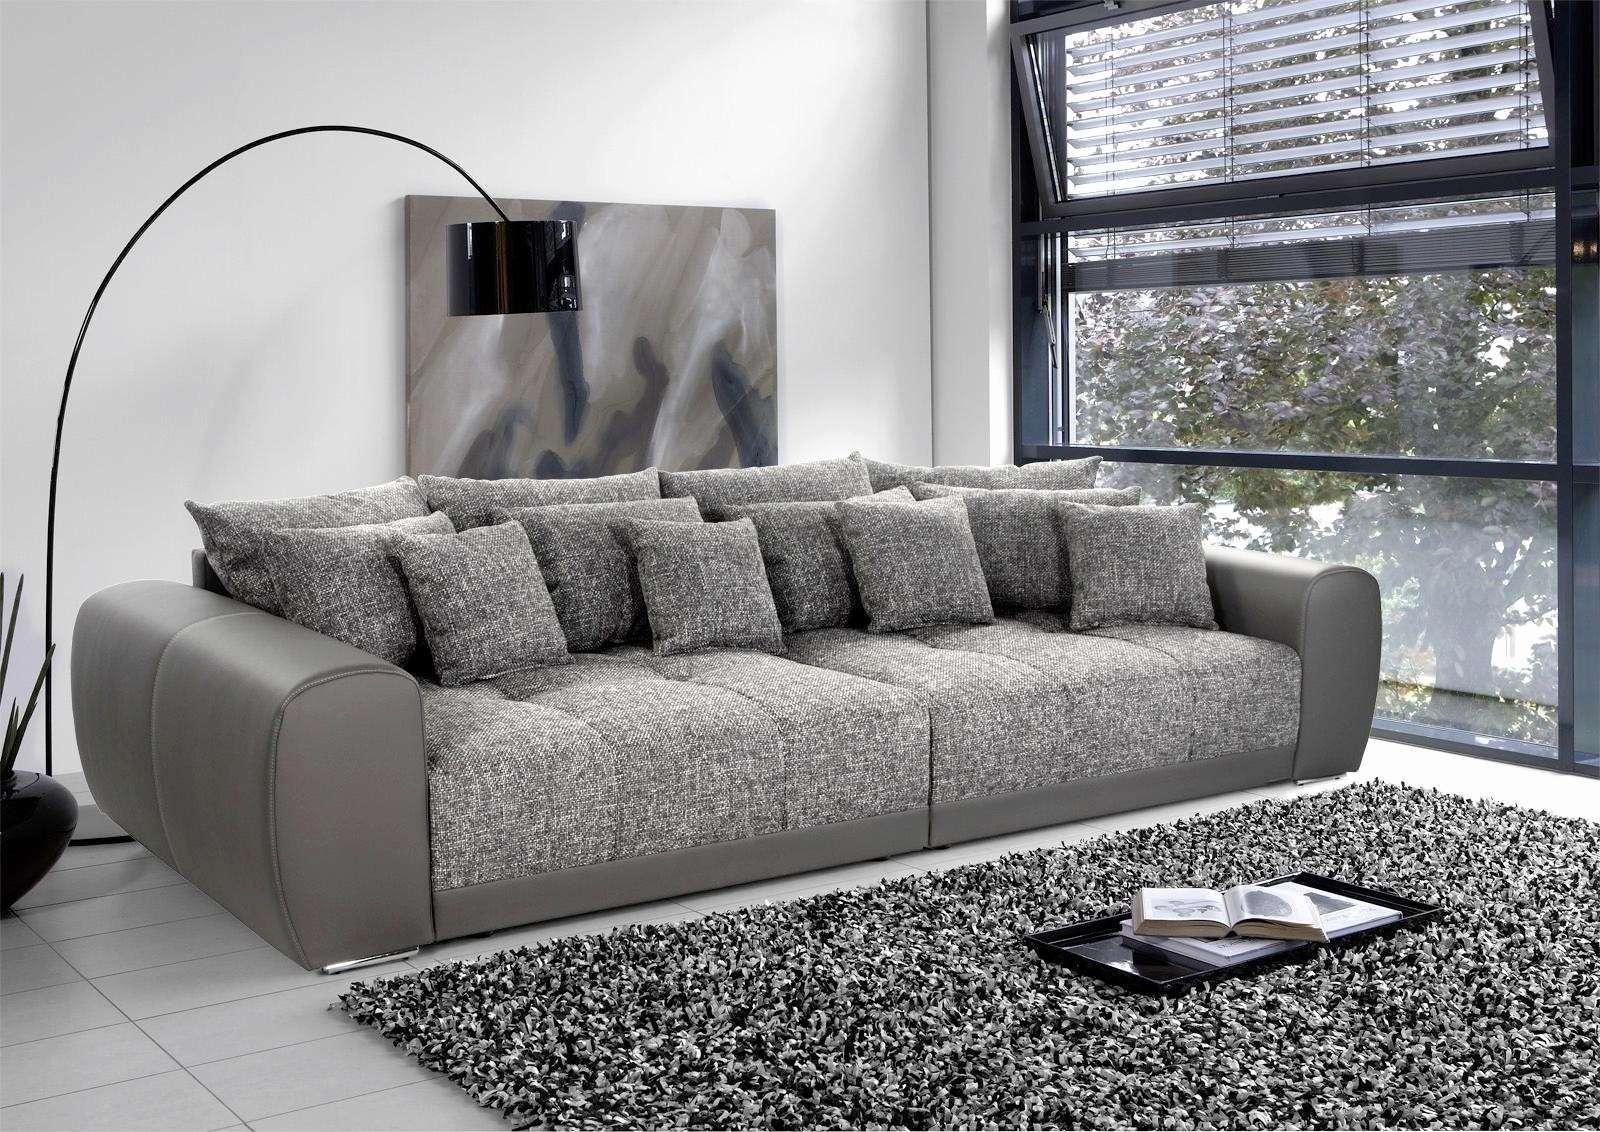 Big sofa Lila Poco Big sofa Ideen Poco sofa Neu sofa Stoff ...